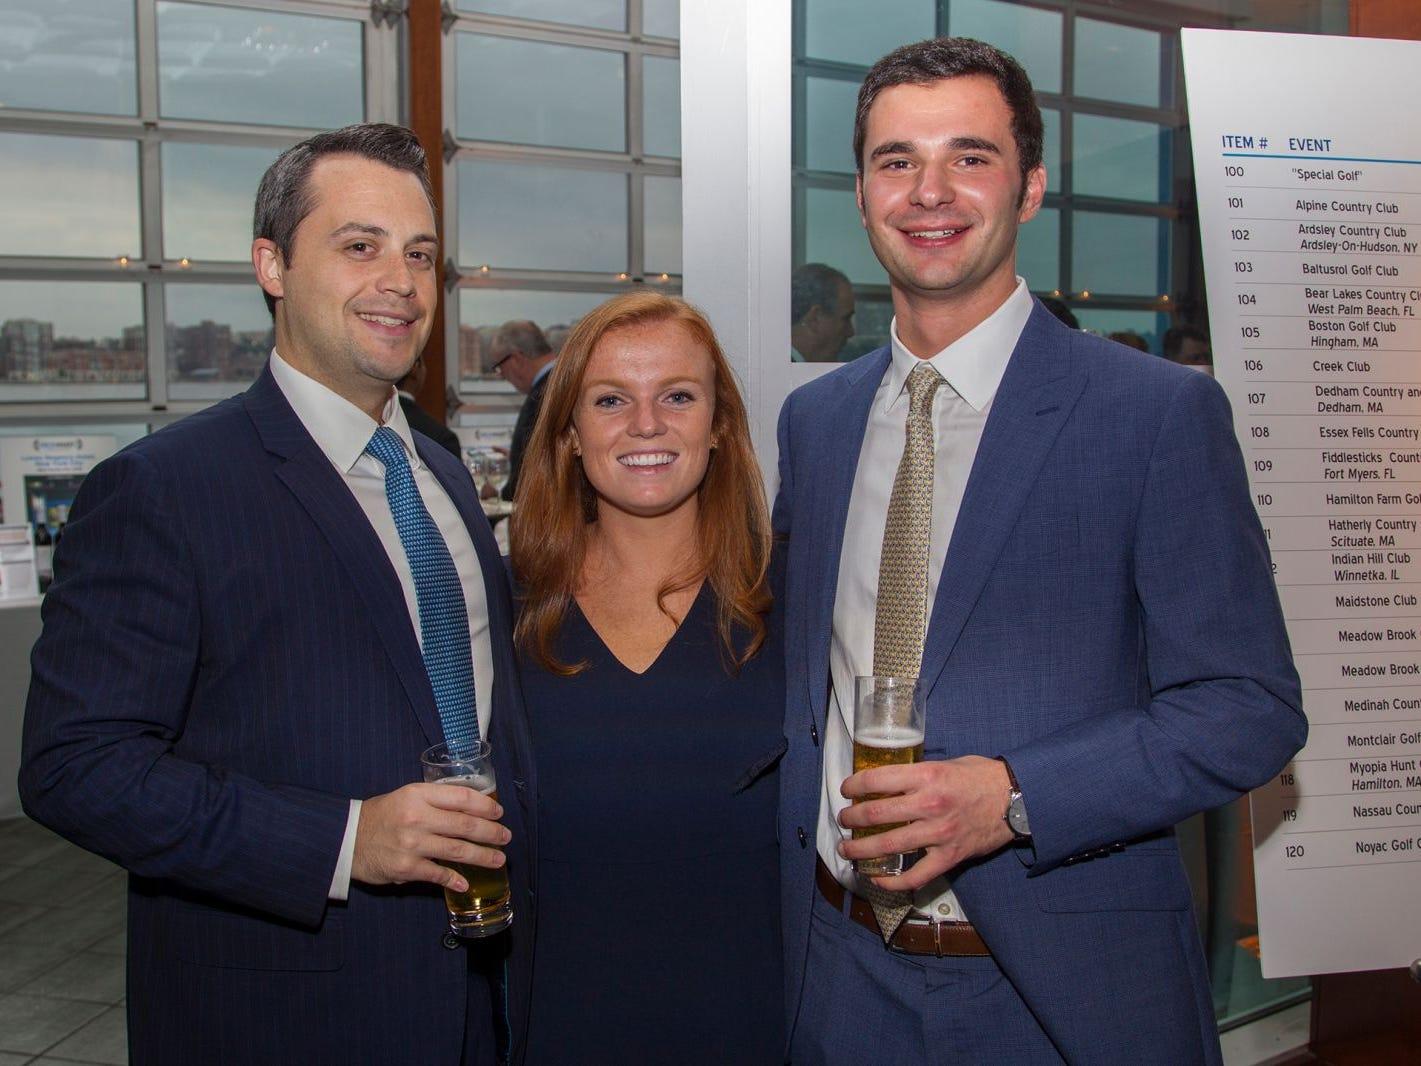 Tom Schneider, Taylor Ryan, Alex Leondis. 11th annual IronMatt Fundraiser Gala at Pier 60 Chelsea Piers. 09/20/2018